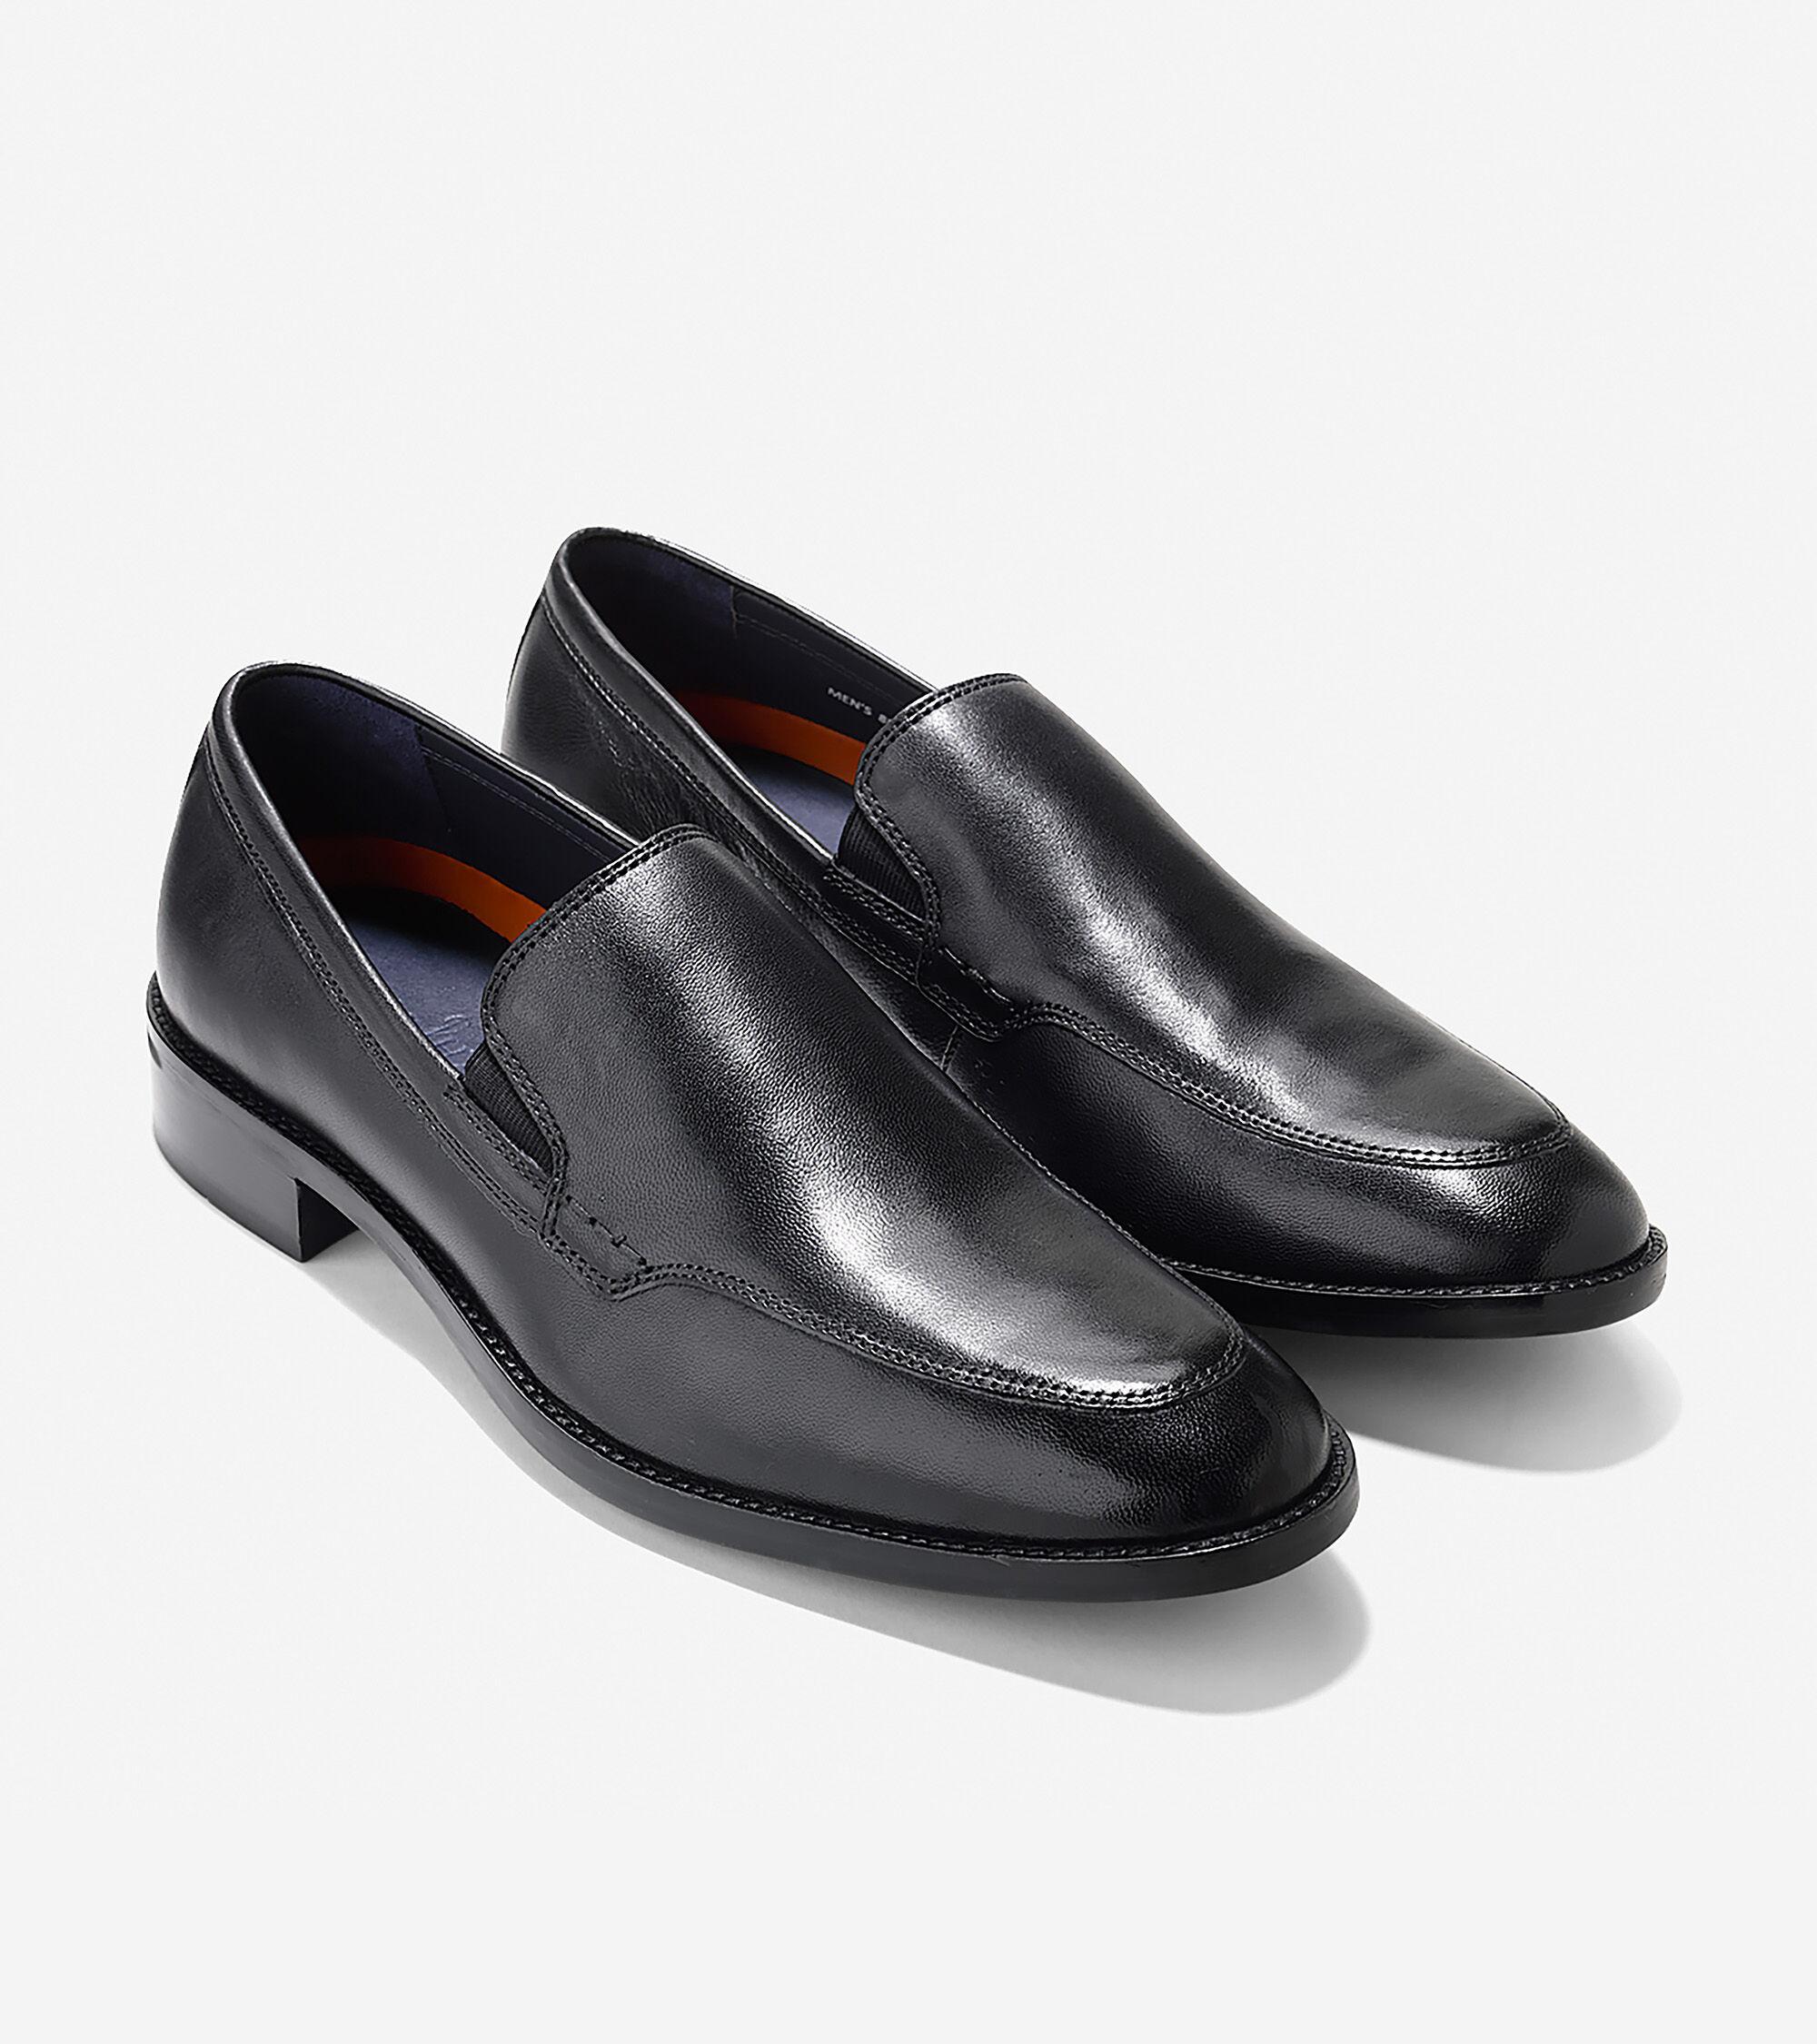 lenox men Pure atlanta stays on the pulse of contemporary style from mcm to balmain & robin's jean - pure releases exclusive contemporary styles daily @pureatlanta.